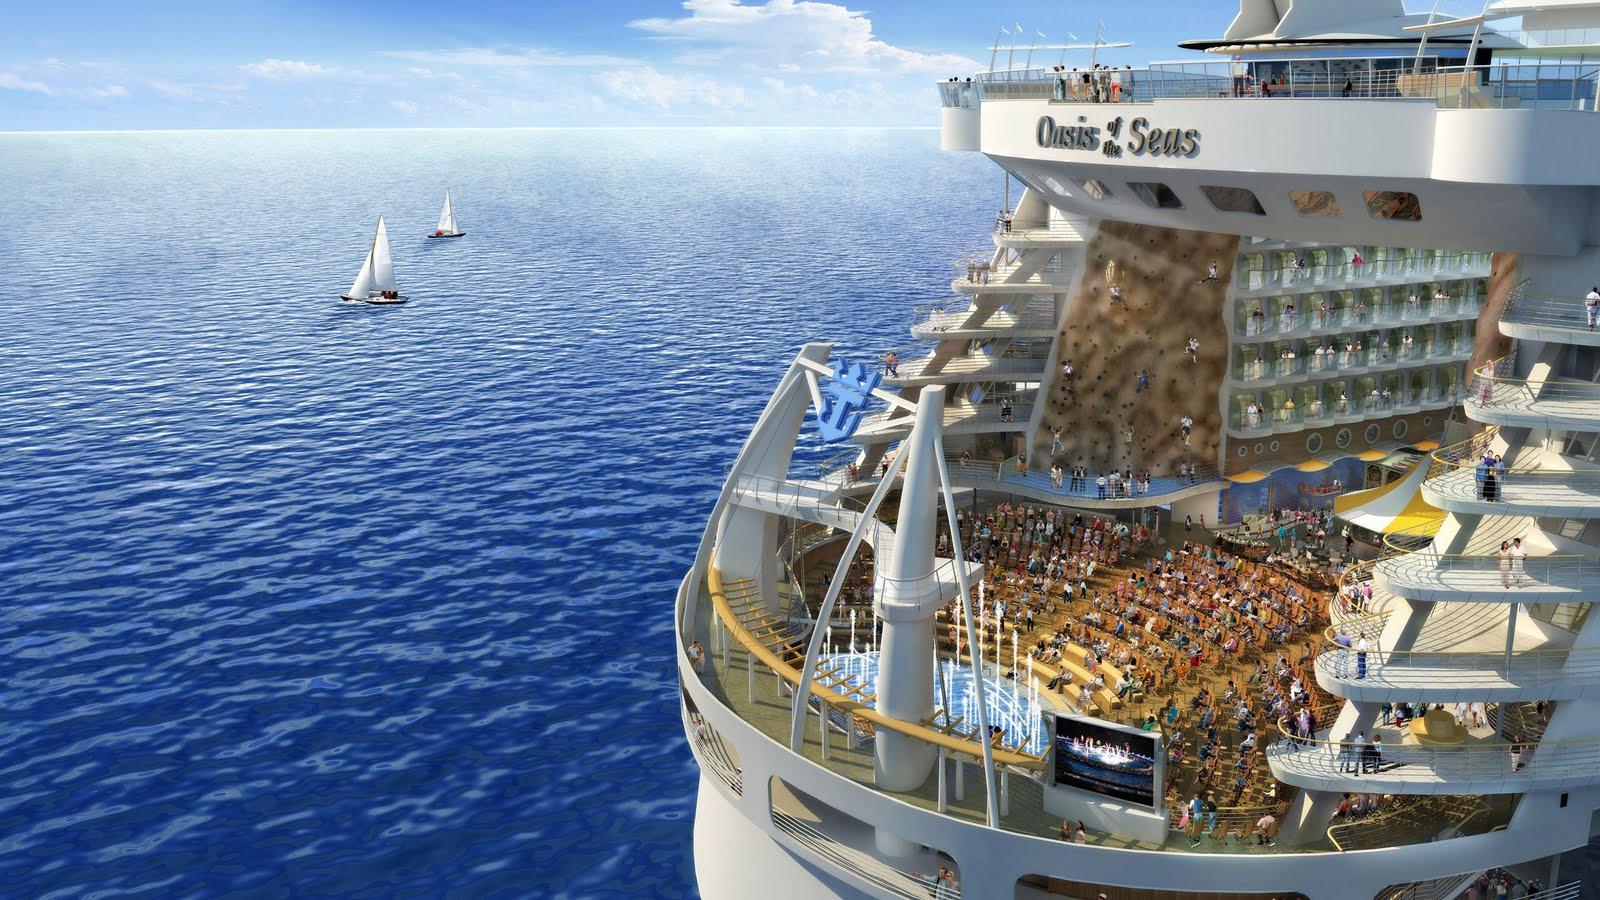 http://1.bp.blogspot.com/-A50JeicUc-M/TcZz7JV-OnI/AAAAAAAAAHA/a96N_jZiMZI/s1600/Royal+Caribbean+Cruises+New+%25285%2529.jpg